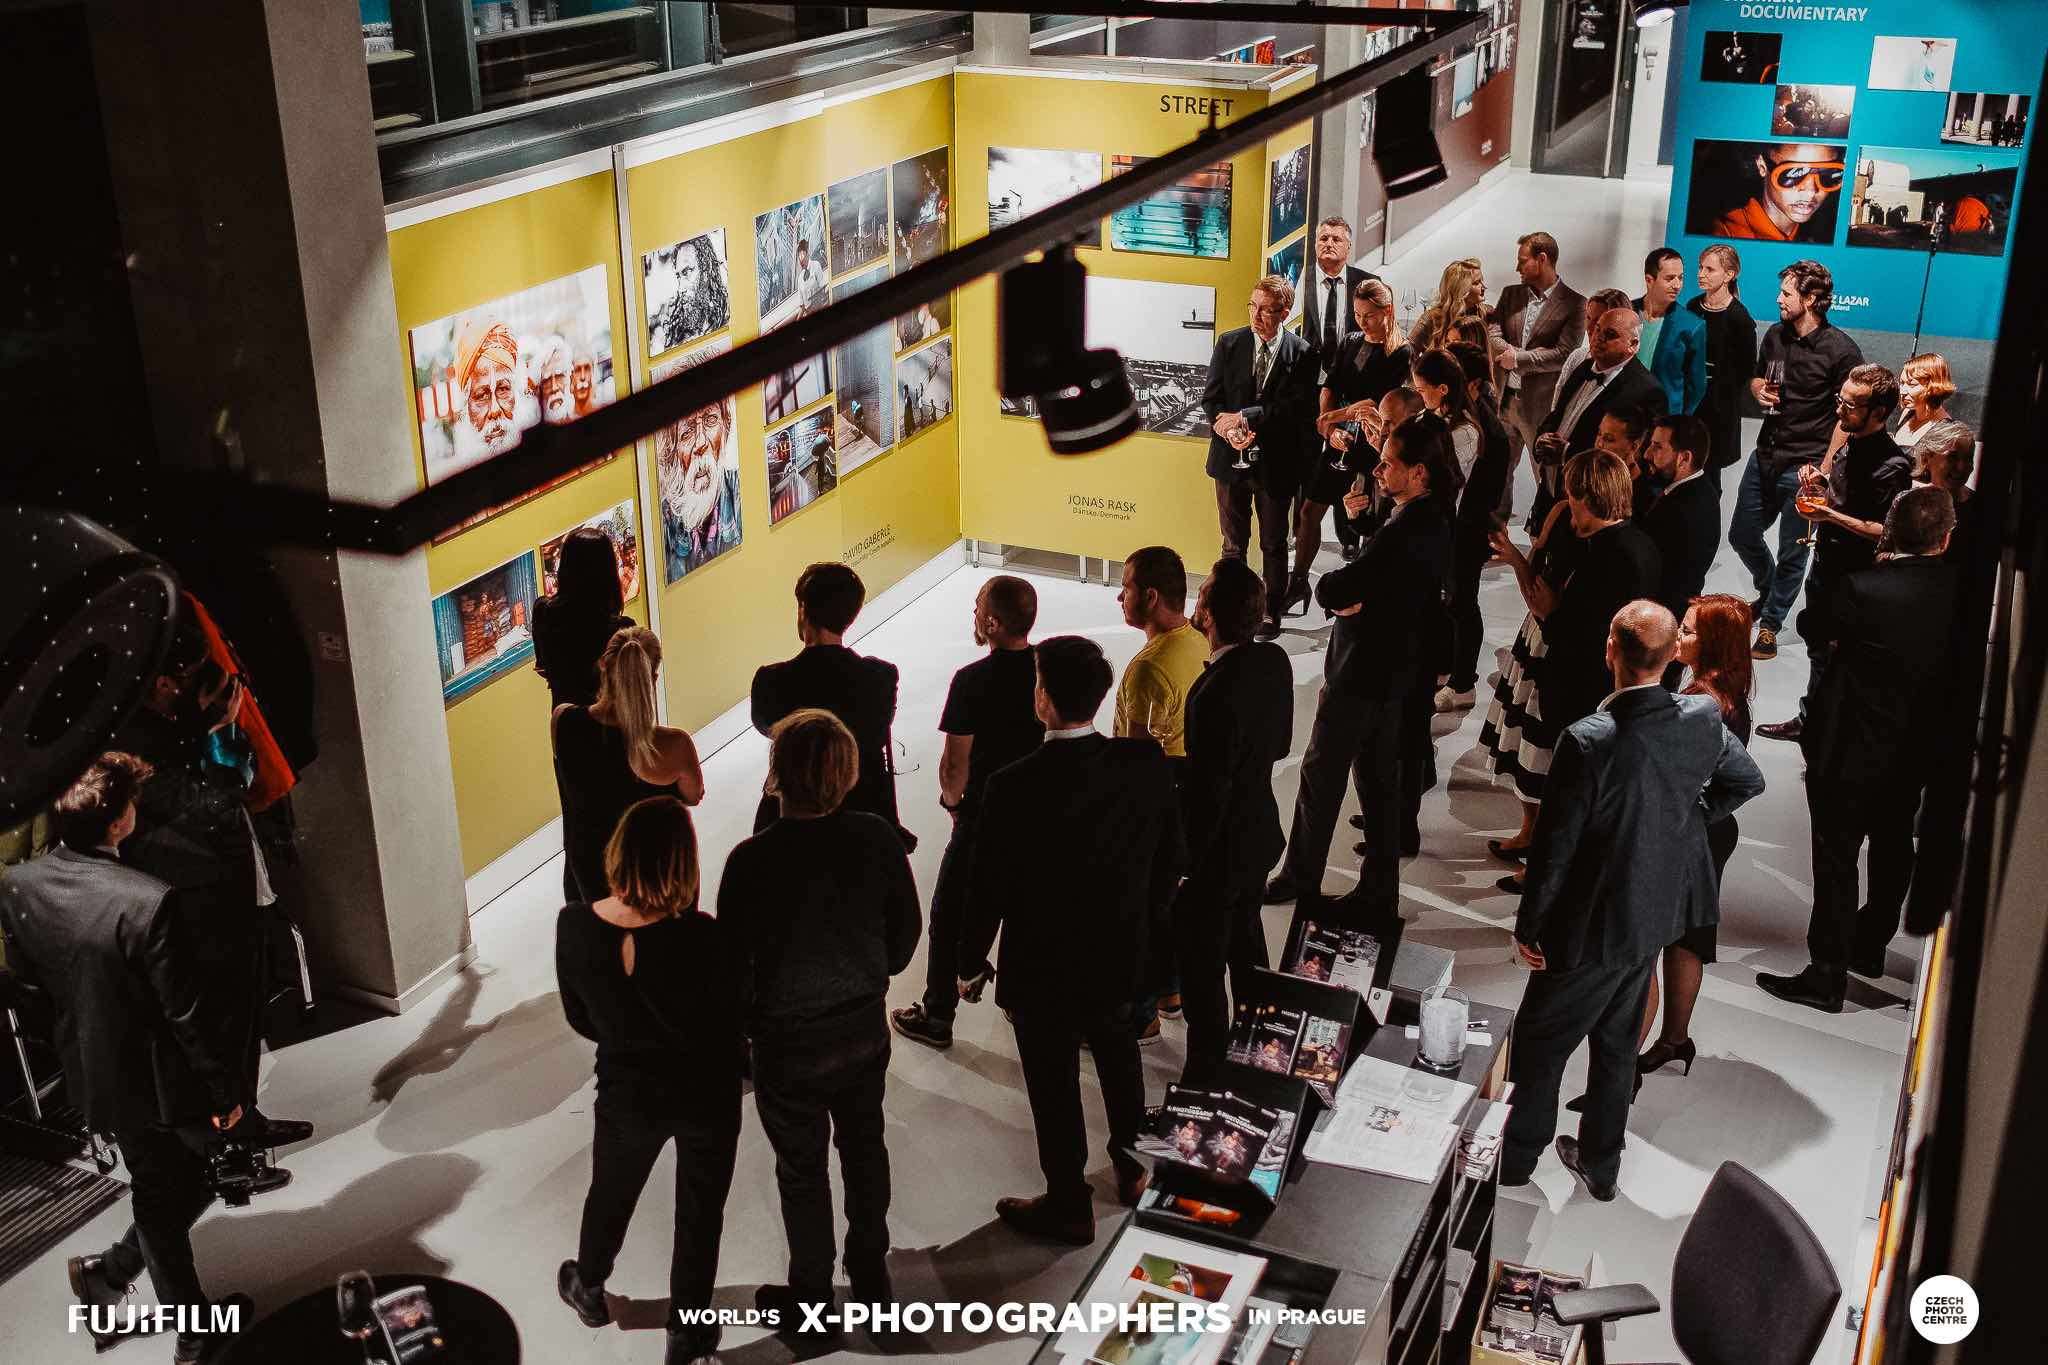 FUJIFILM World X-Photographers czech republic prague photography exhibition opening